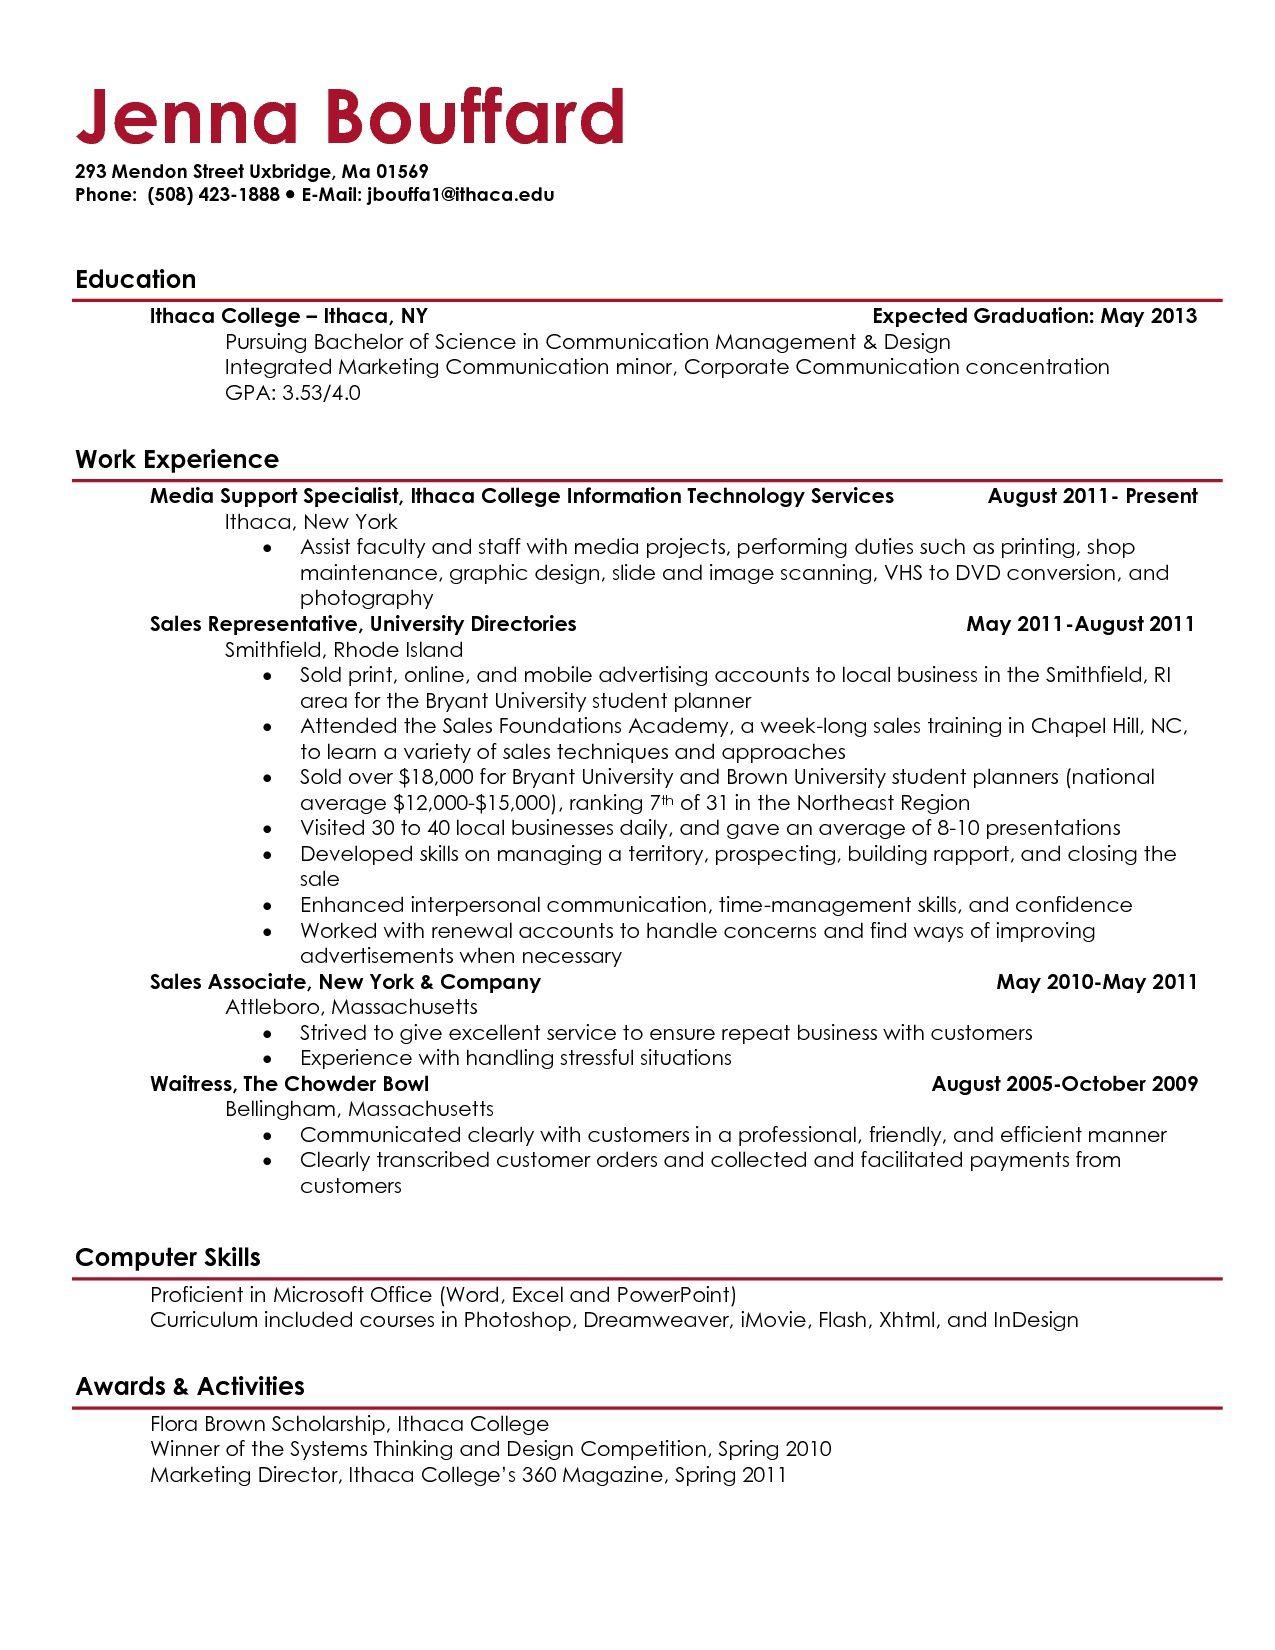 005 Fascinating College Graduate Resume Template Design  Templates Grad Example Recent ObjectiveFull